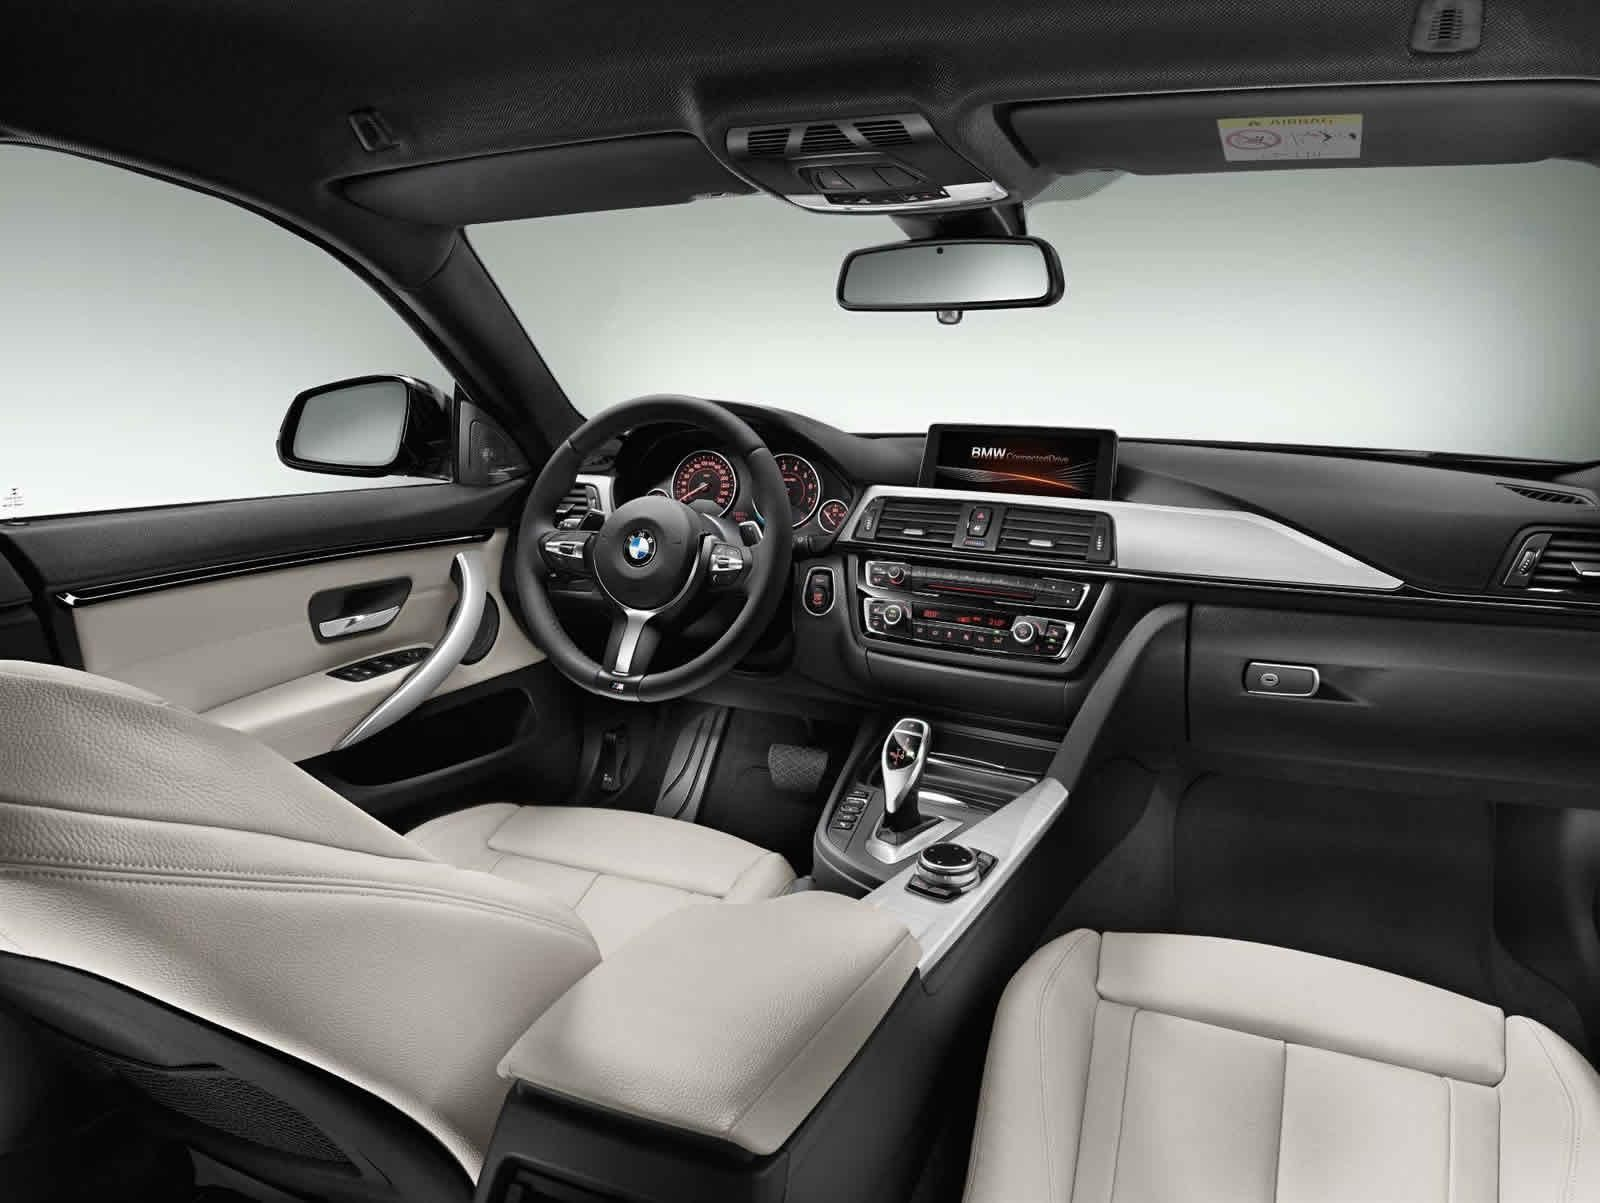 102yeni-bmw-4-serisi-gran-coupe-detayli-